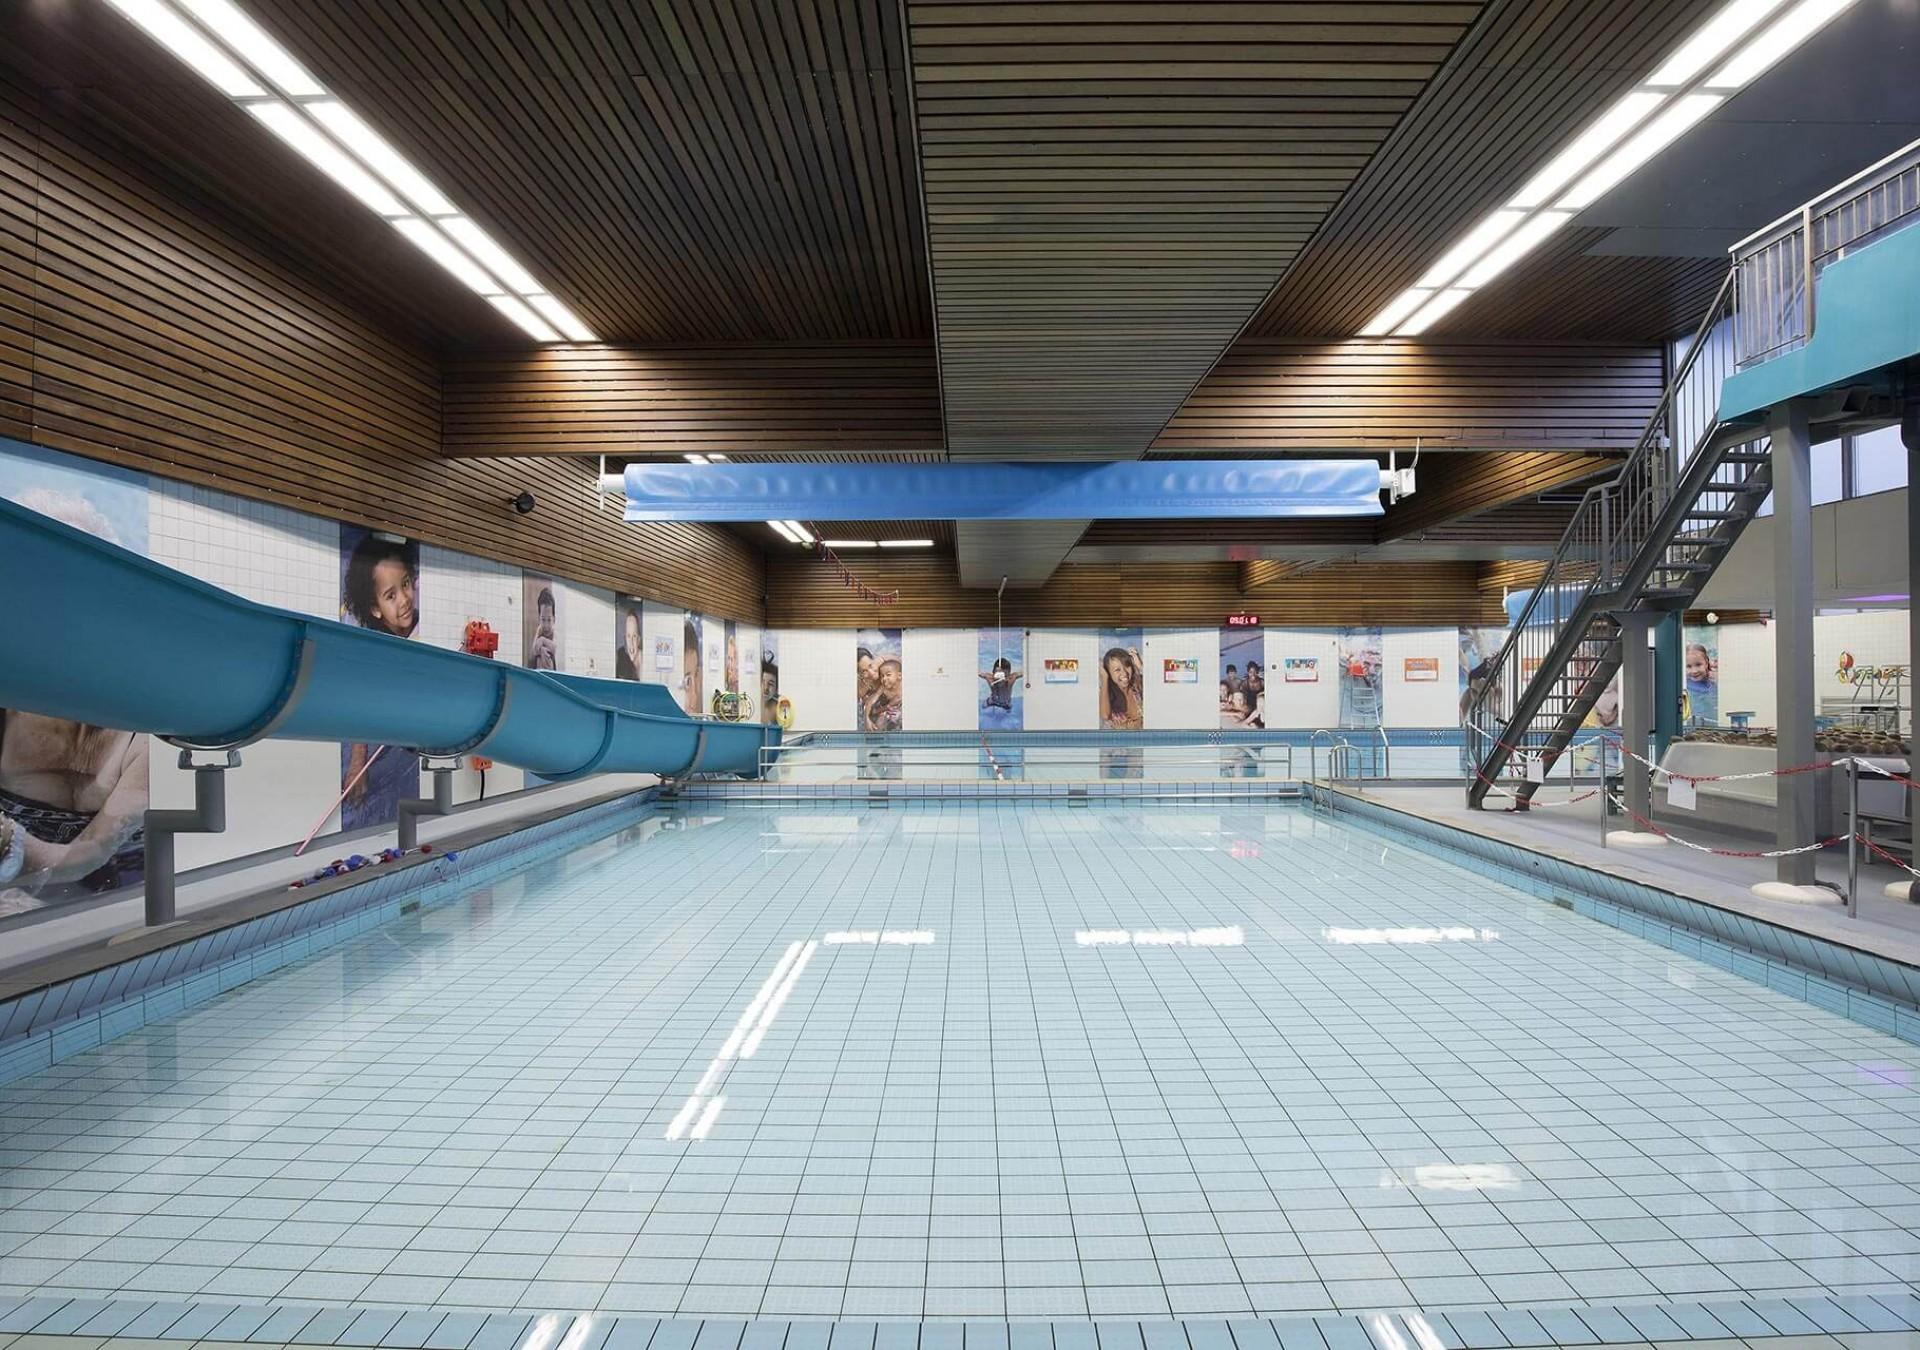 Zwembad afrikaanderplein u sportbedrijf rotterdam